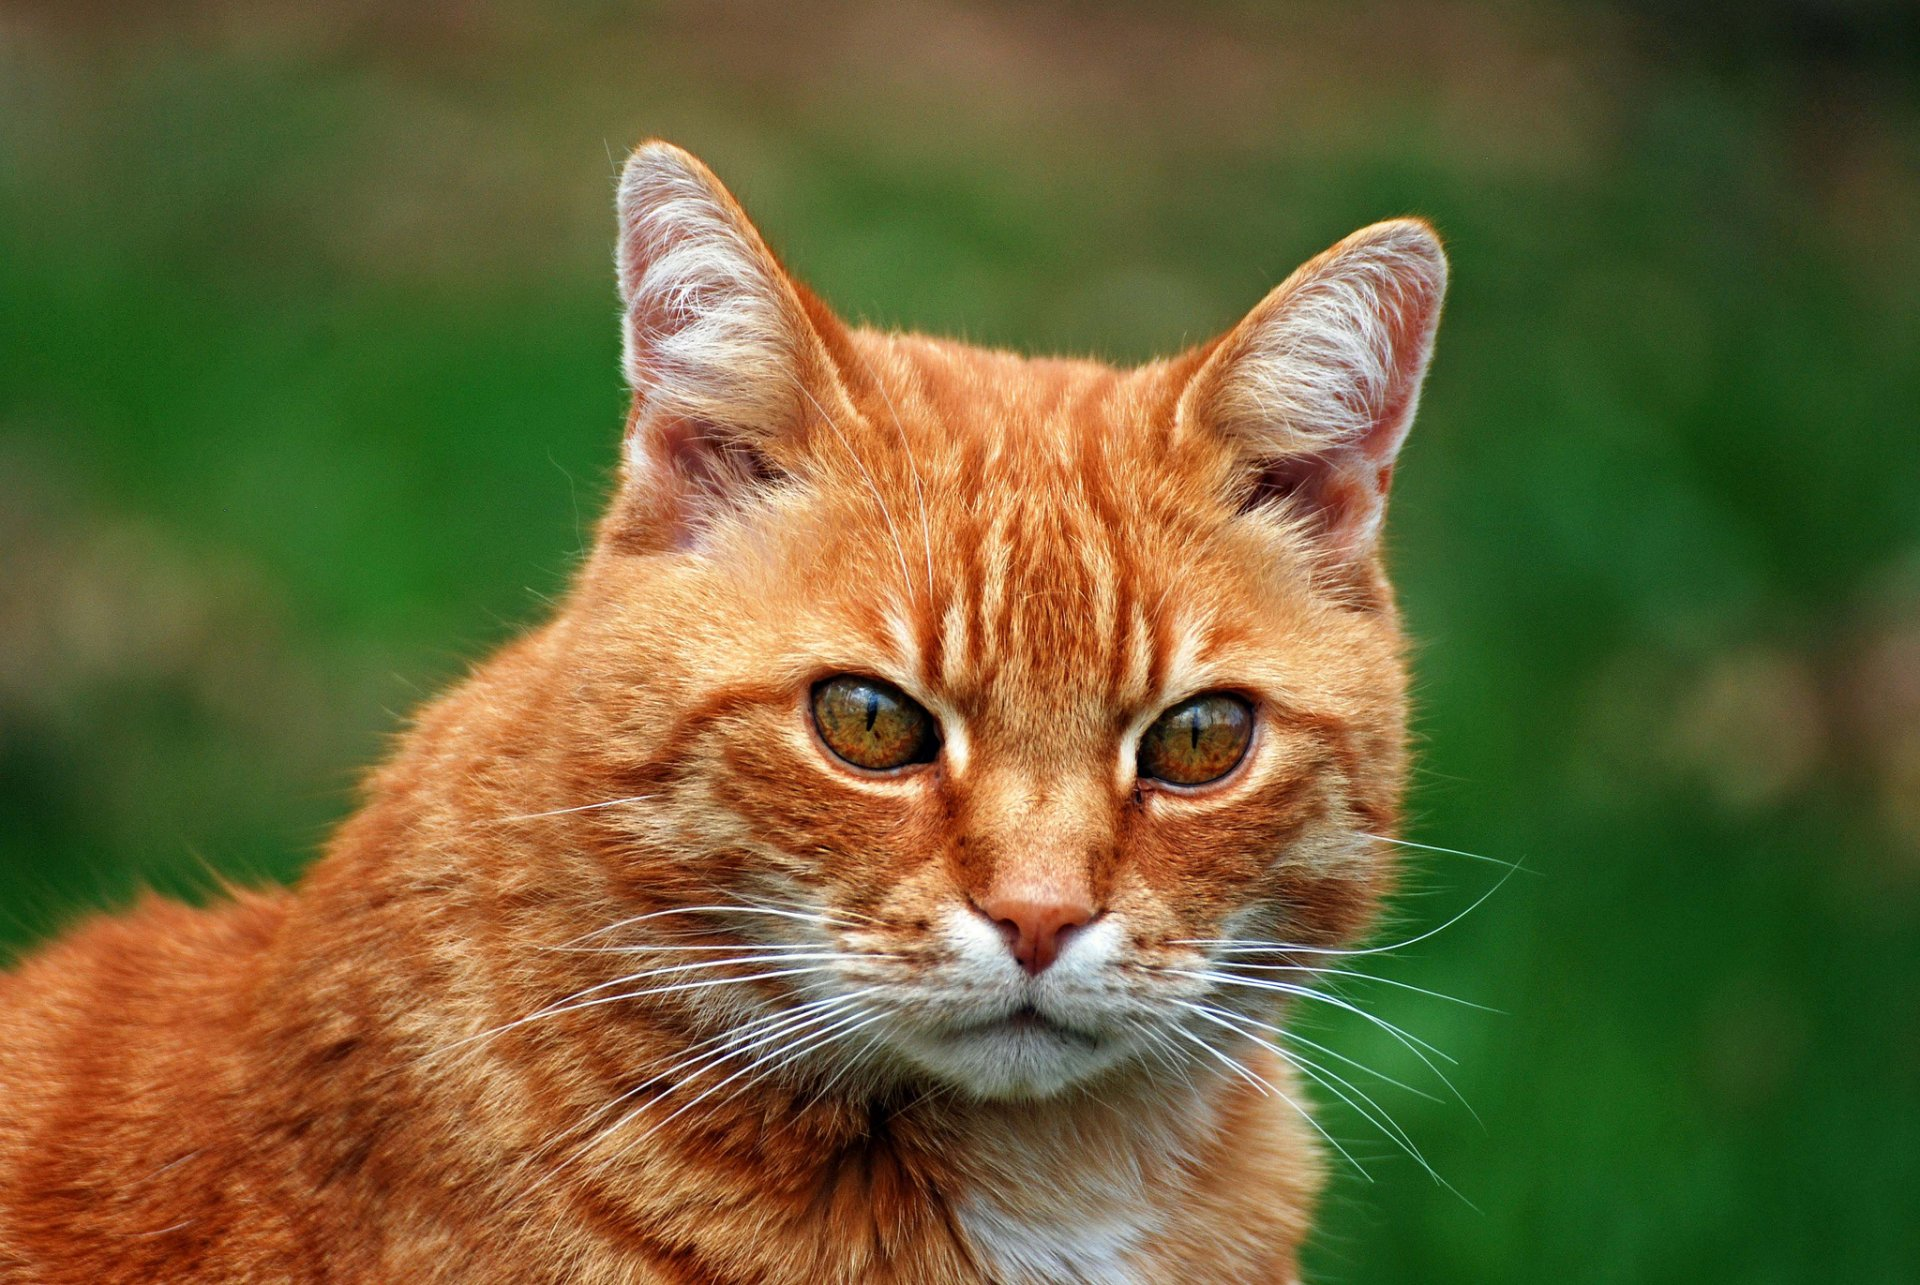 Рыжие кошки картинки фото, картинки